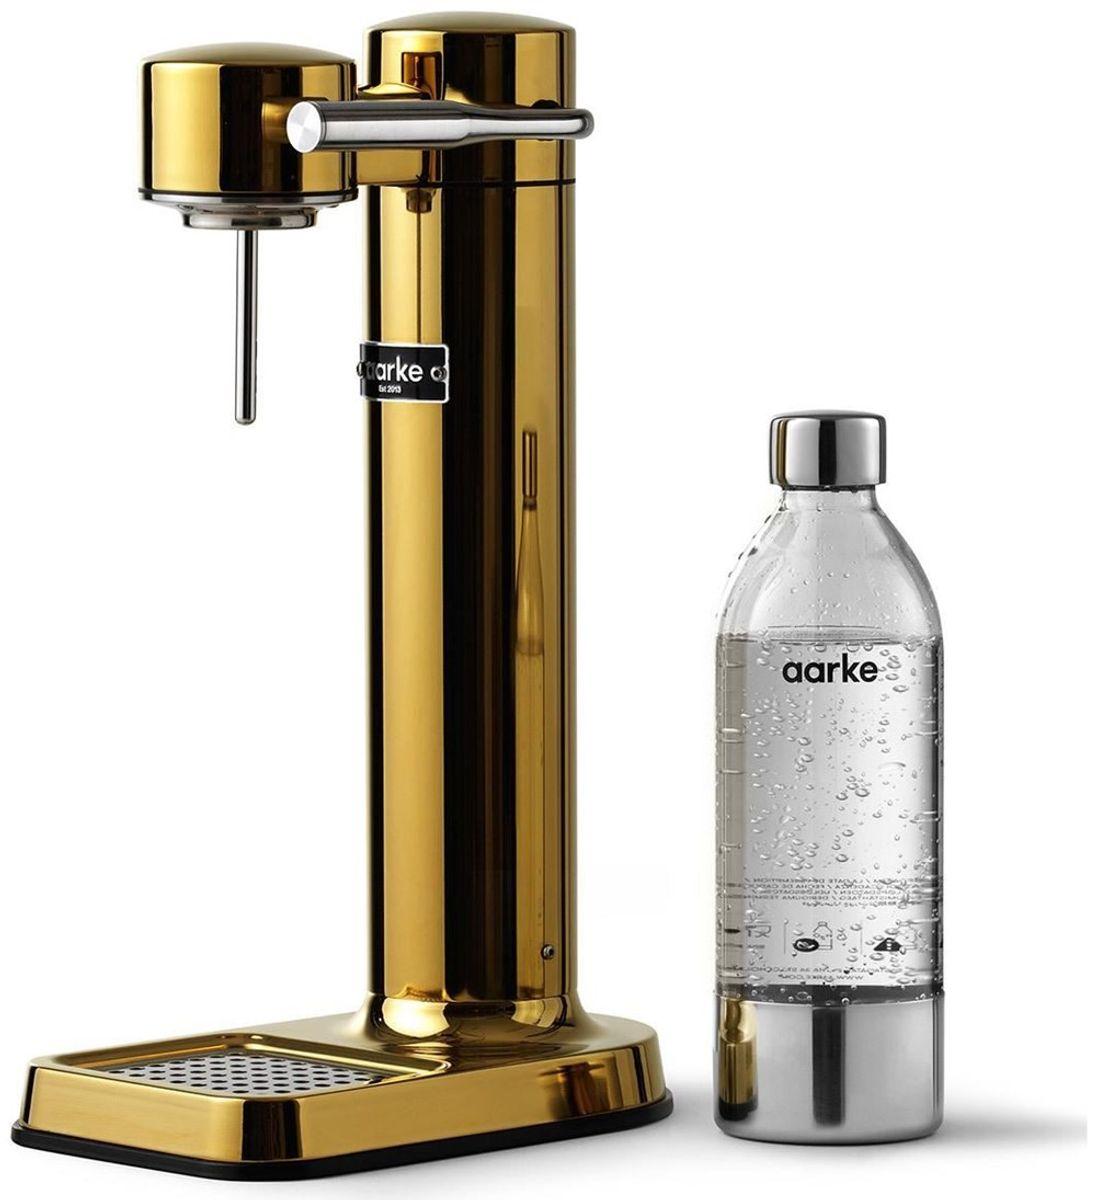 Aarke Carbonator III Wassersprudler in gold